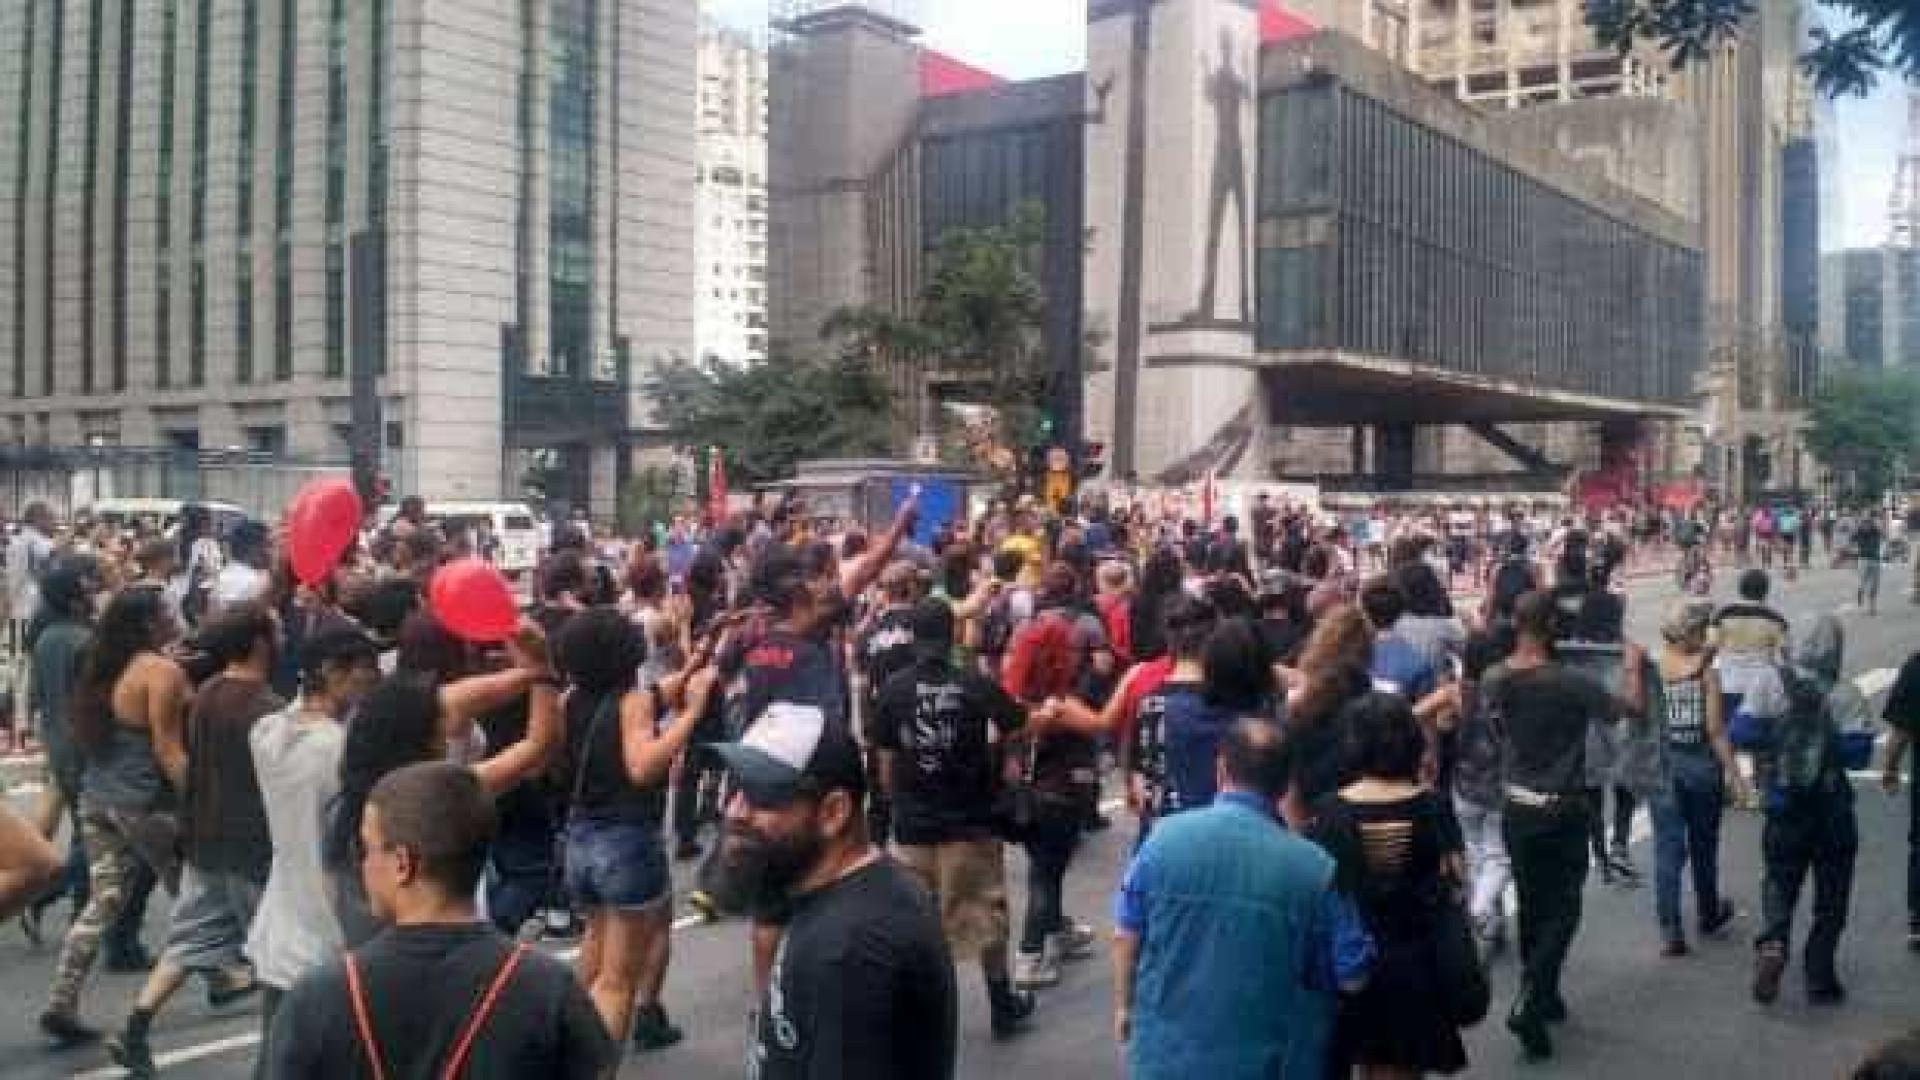 Marcha para Satanás leva 150 manifestantes para a Avenida Paulista